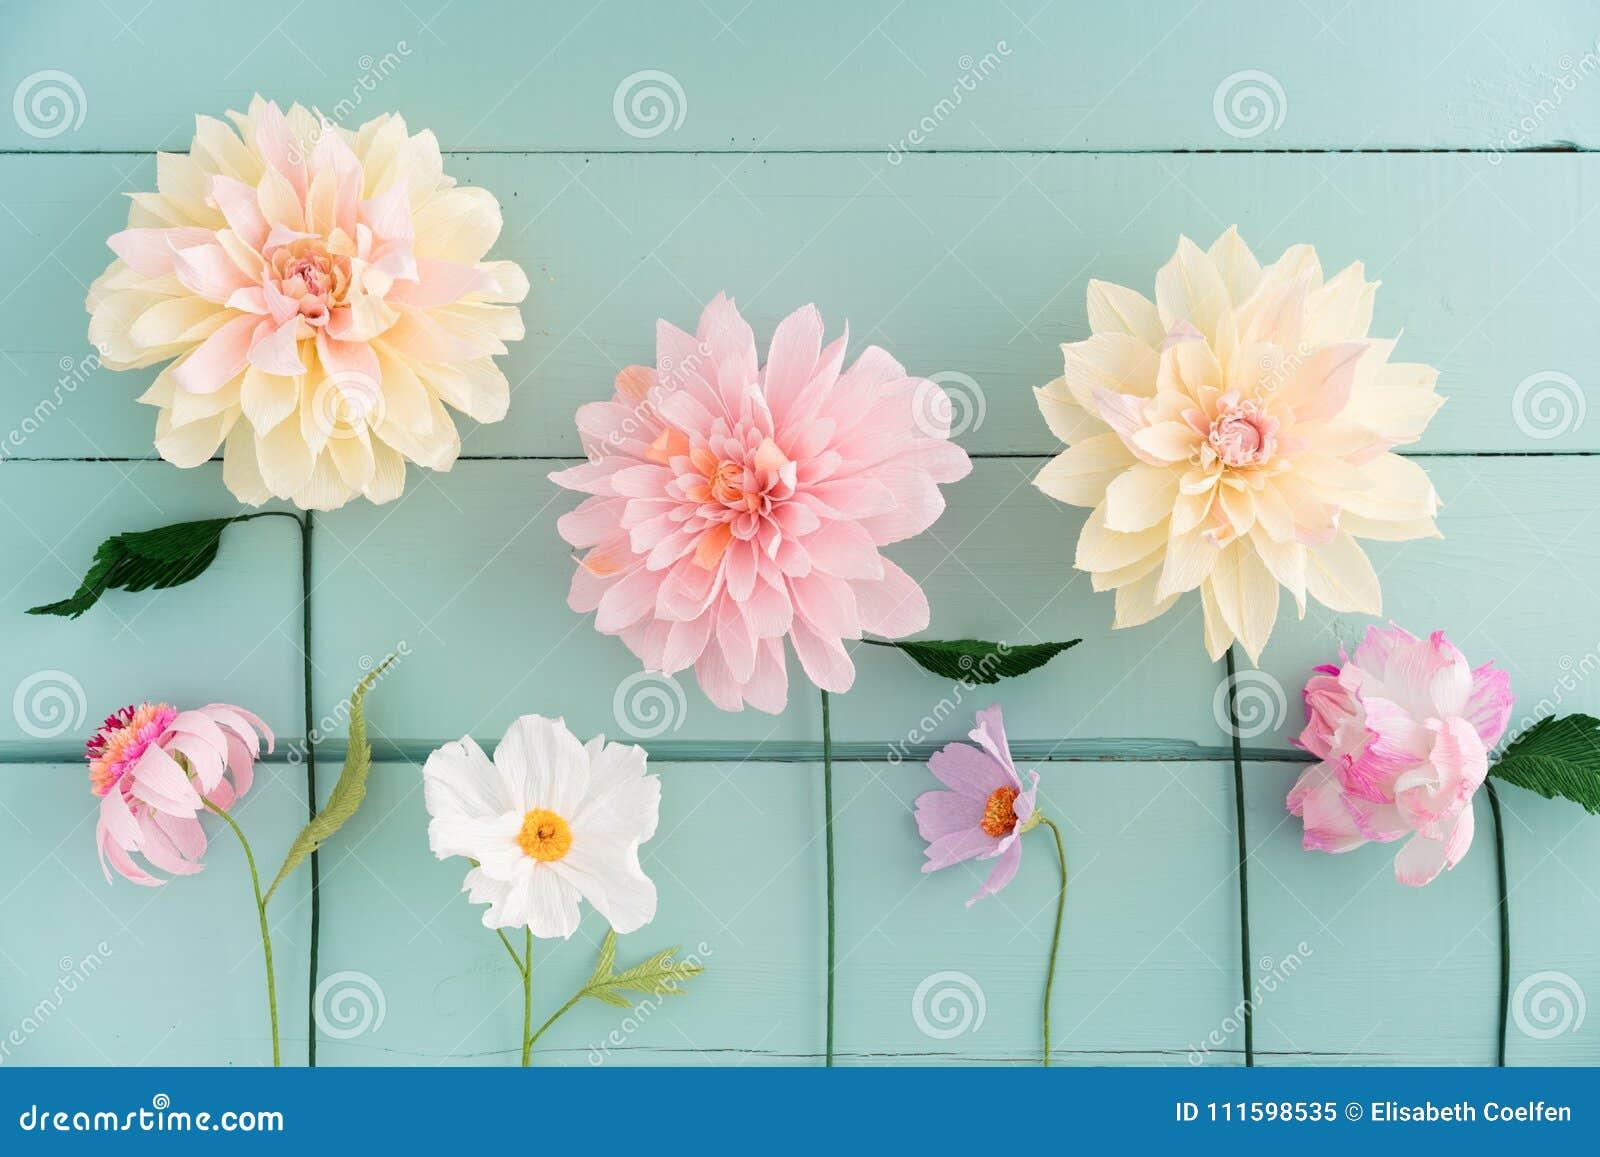 Fiori Carta Crespa.Crepe Paper Flowers Stock Image Image Of Dahlias Paper 111598535